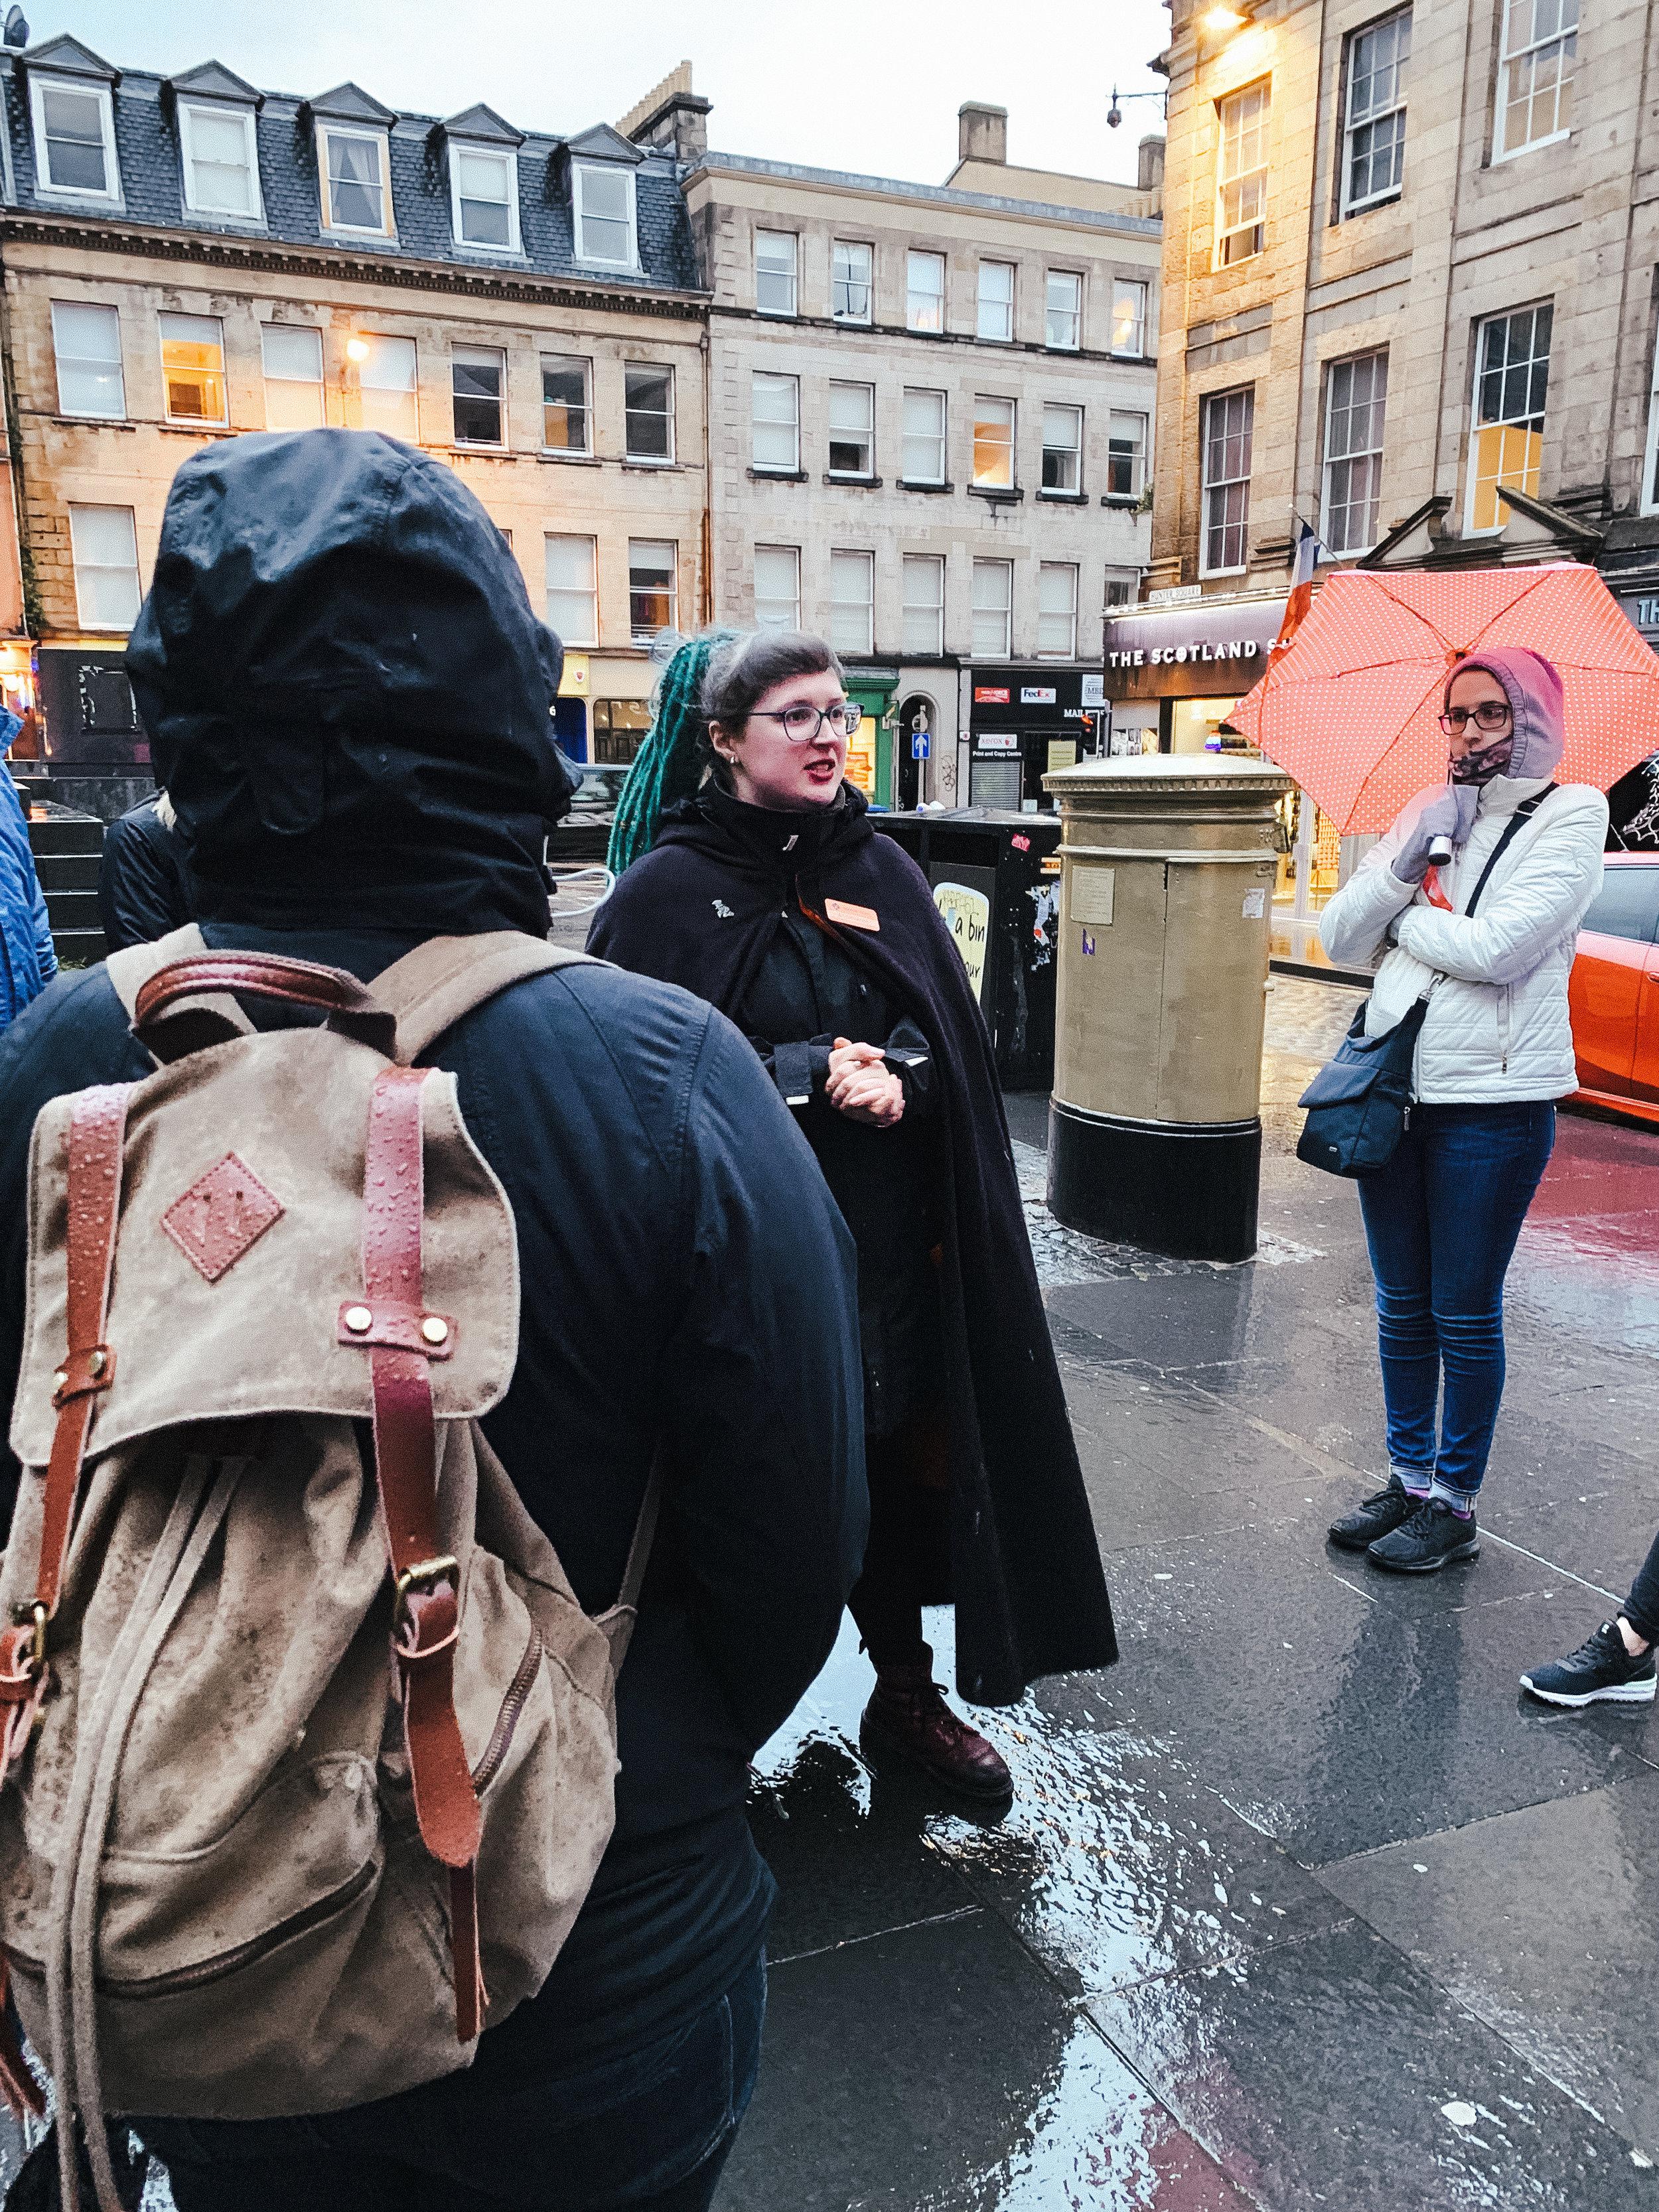 LSS Mercat Tours Edinburgh Scotland